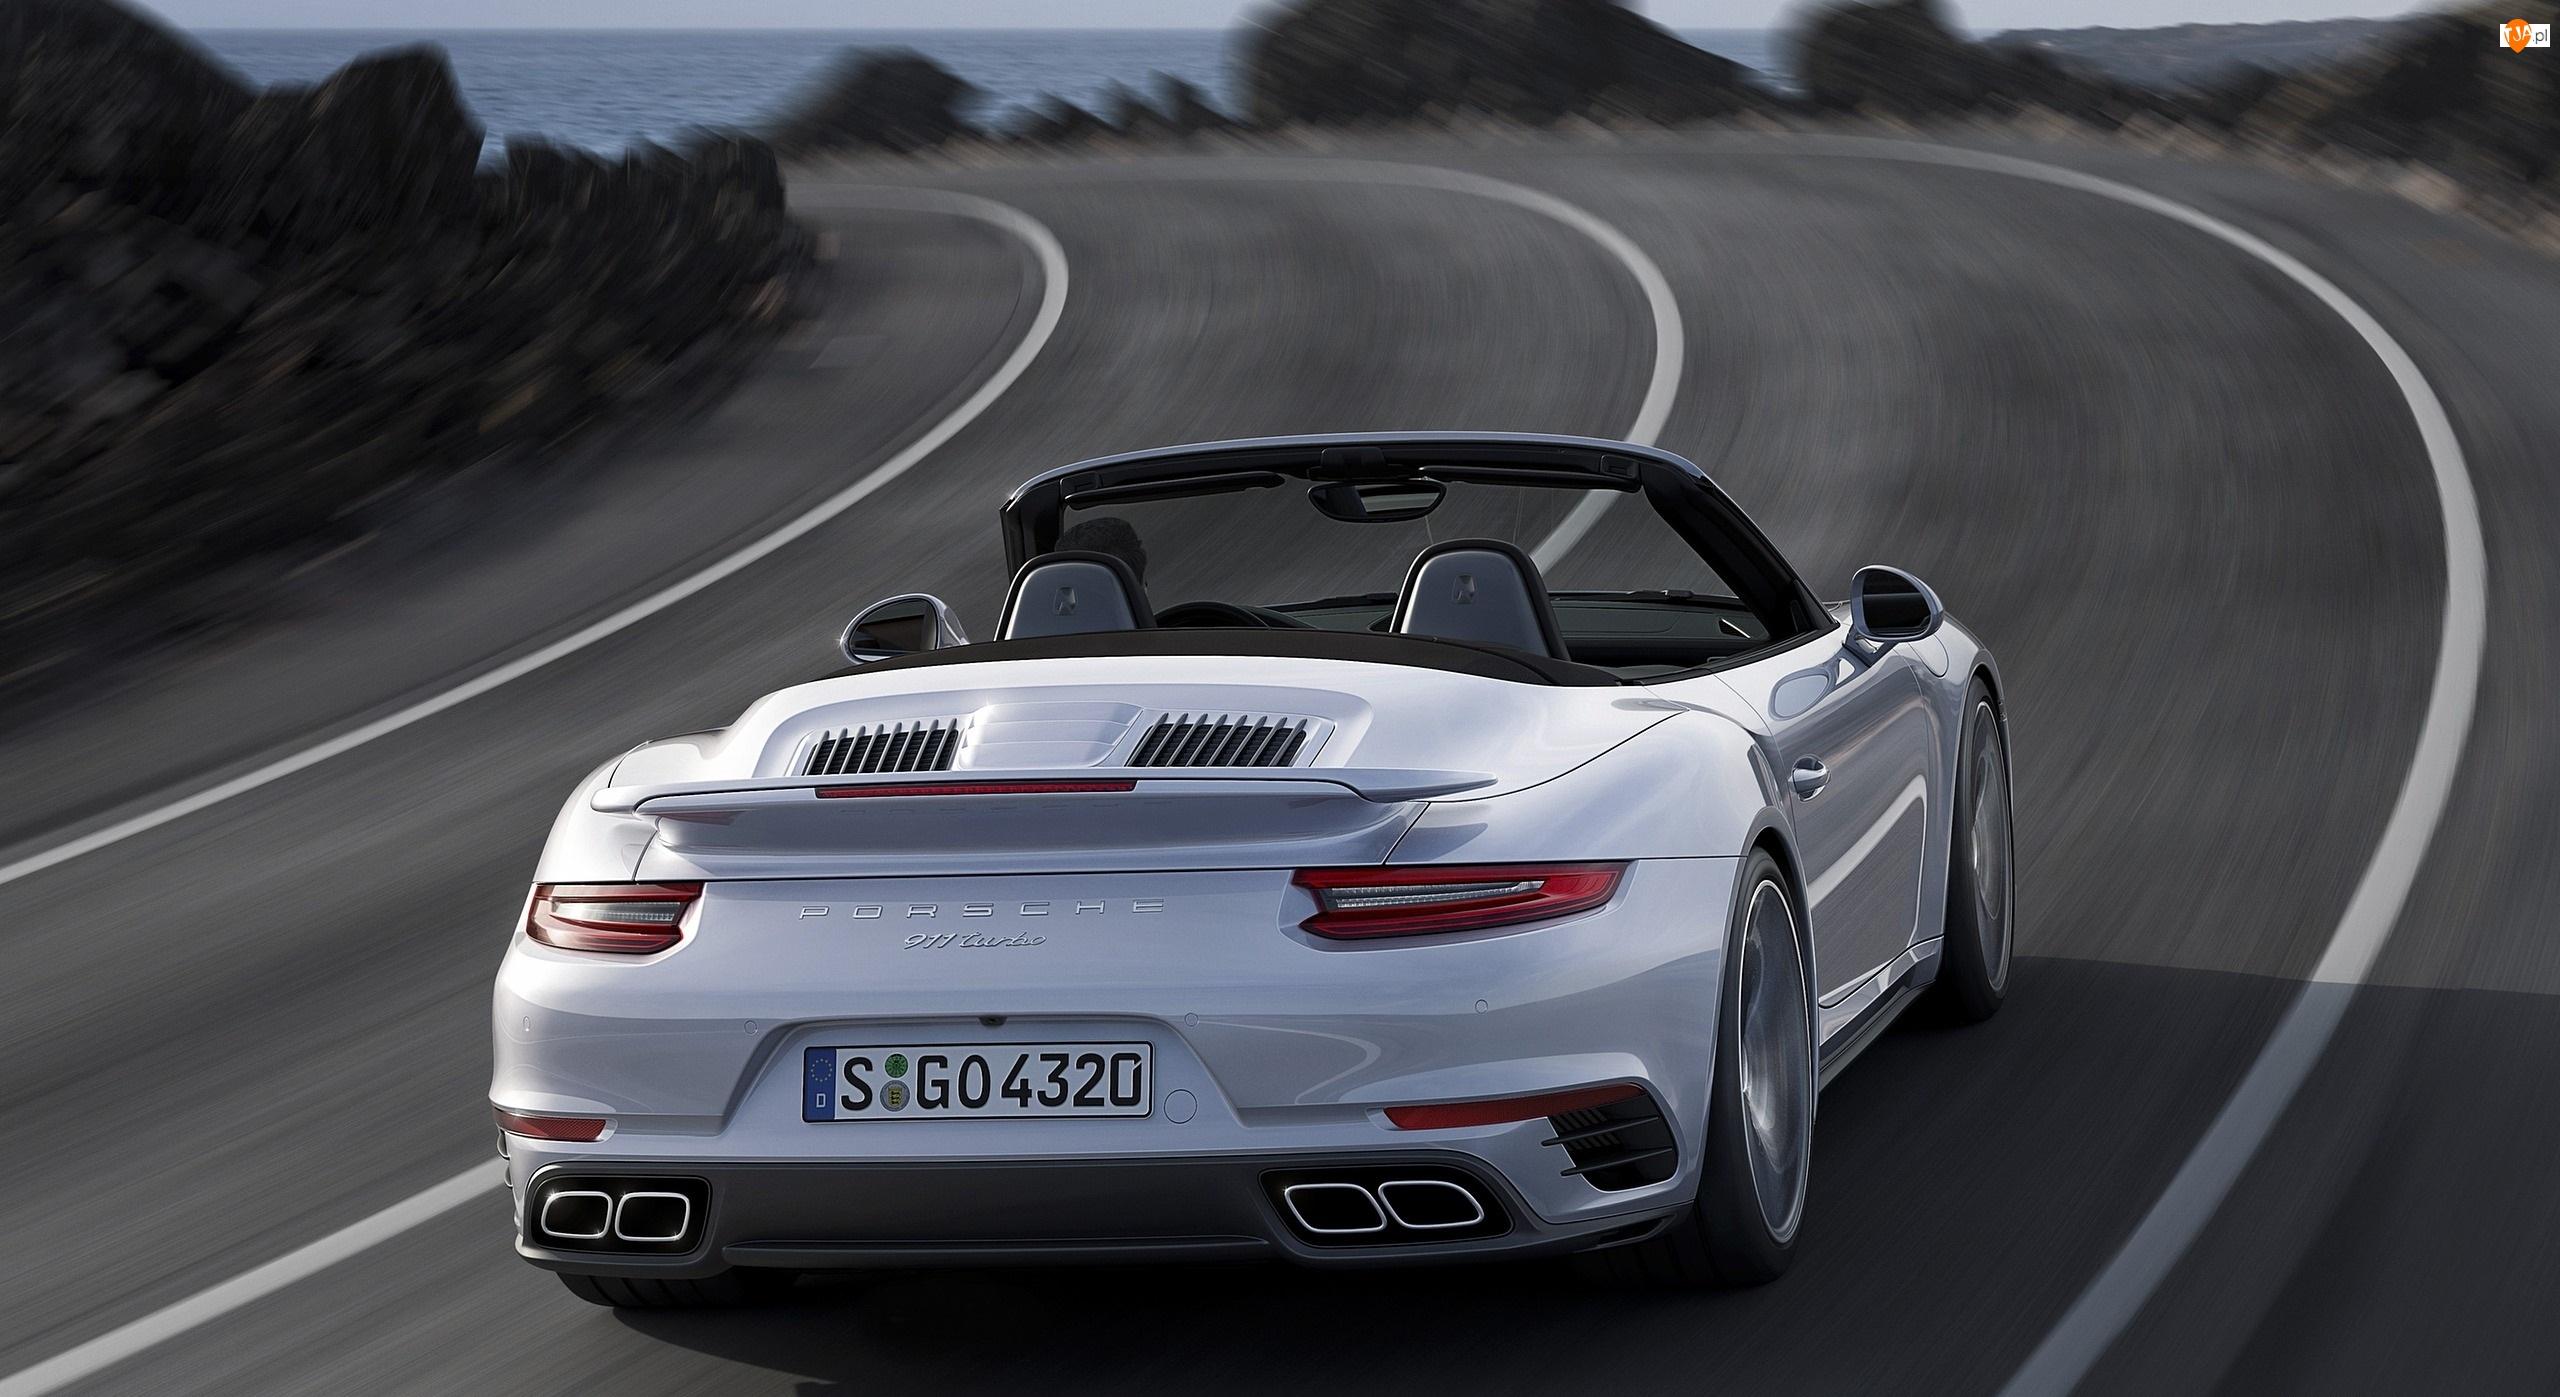 Droga, Porsche, 911 Turbo